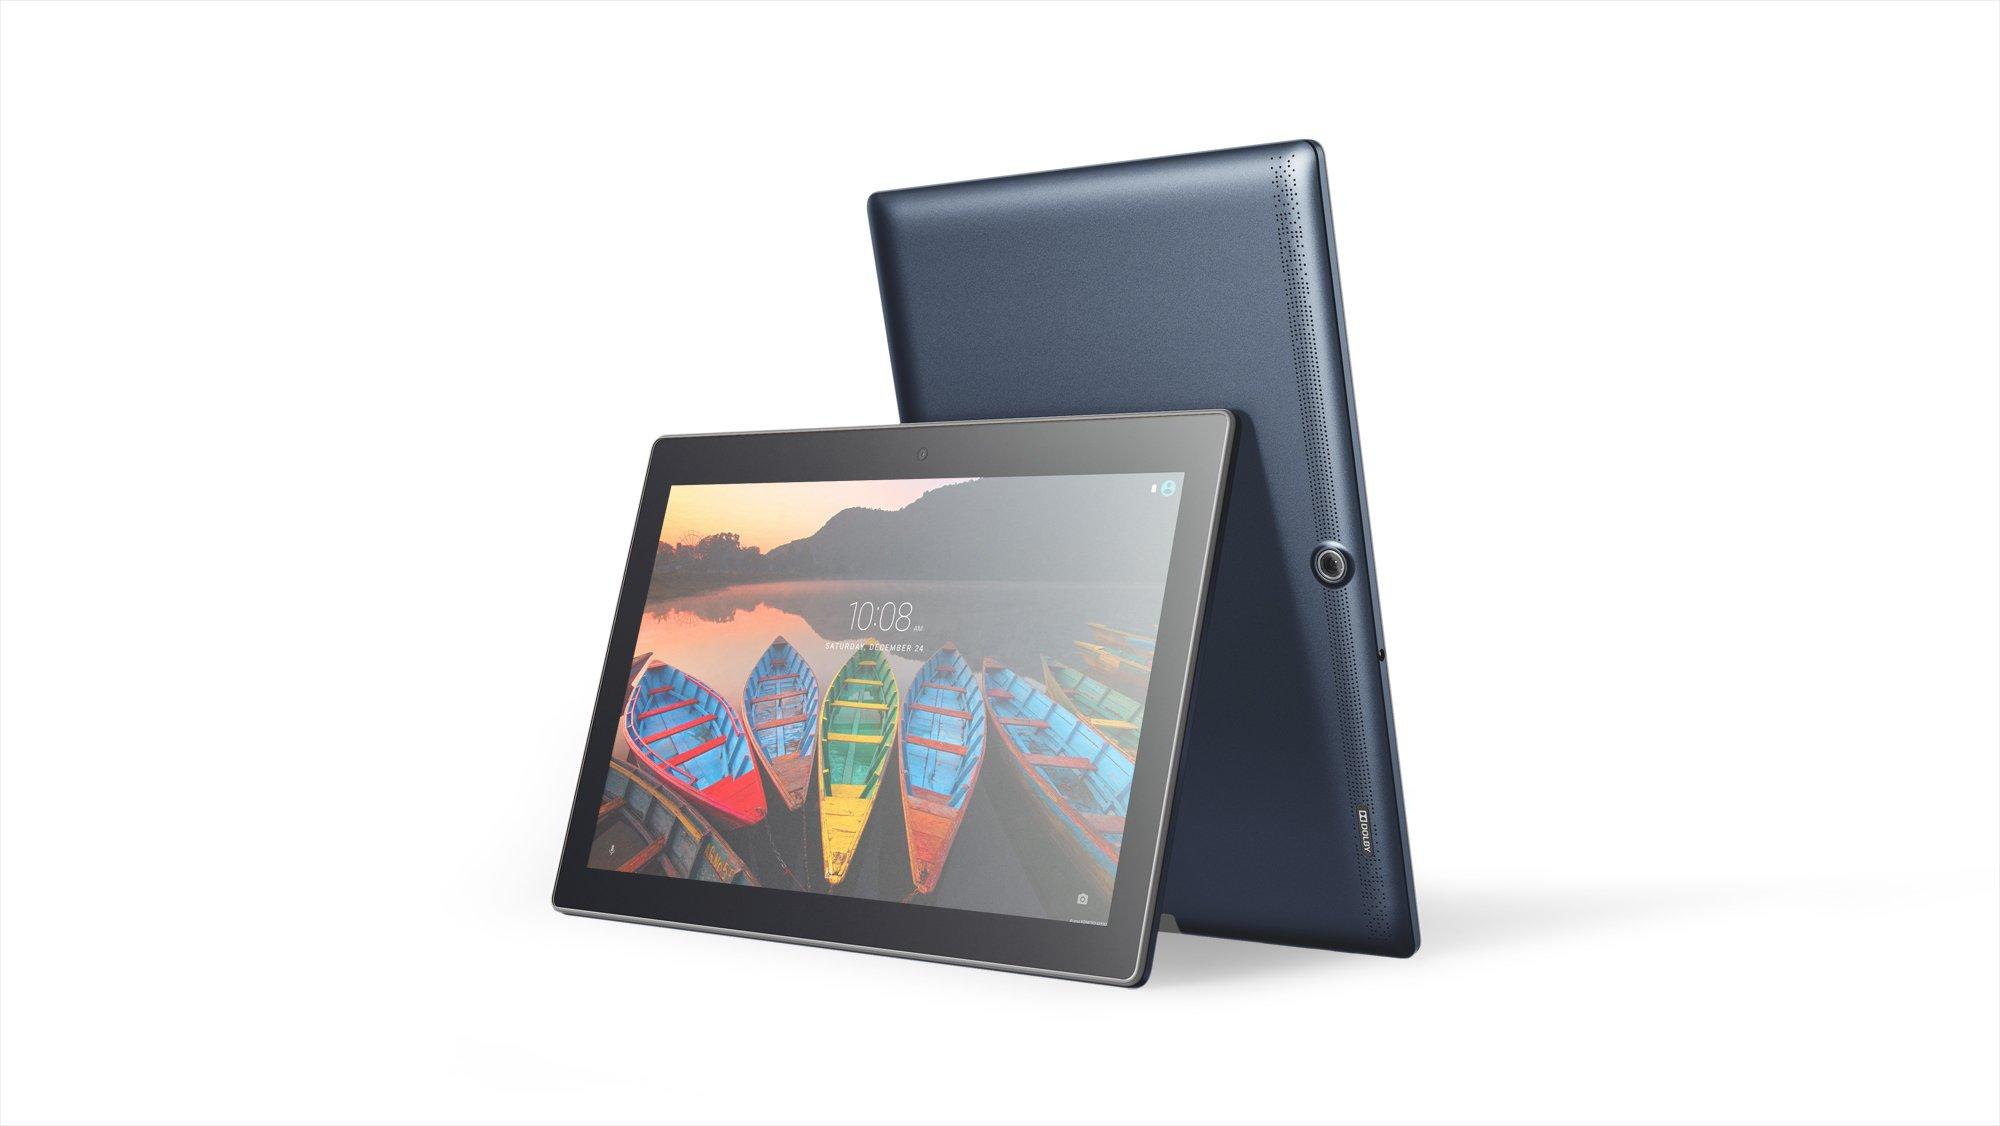 Lenovo Tab 3 Plus - 10.1'' Android Tablet (Qualcomm 1.3GHz Processor, 2 GB RAM, 16 GB SSD, Android 6.0) TB3-X70F